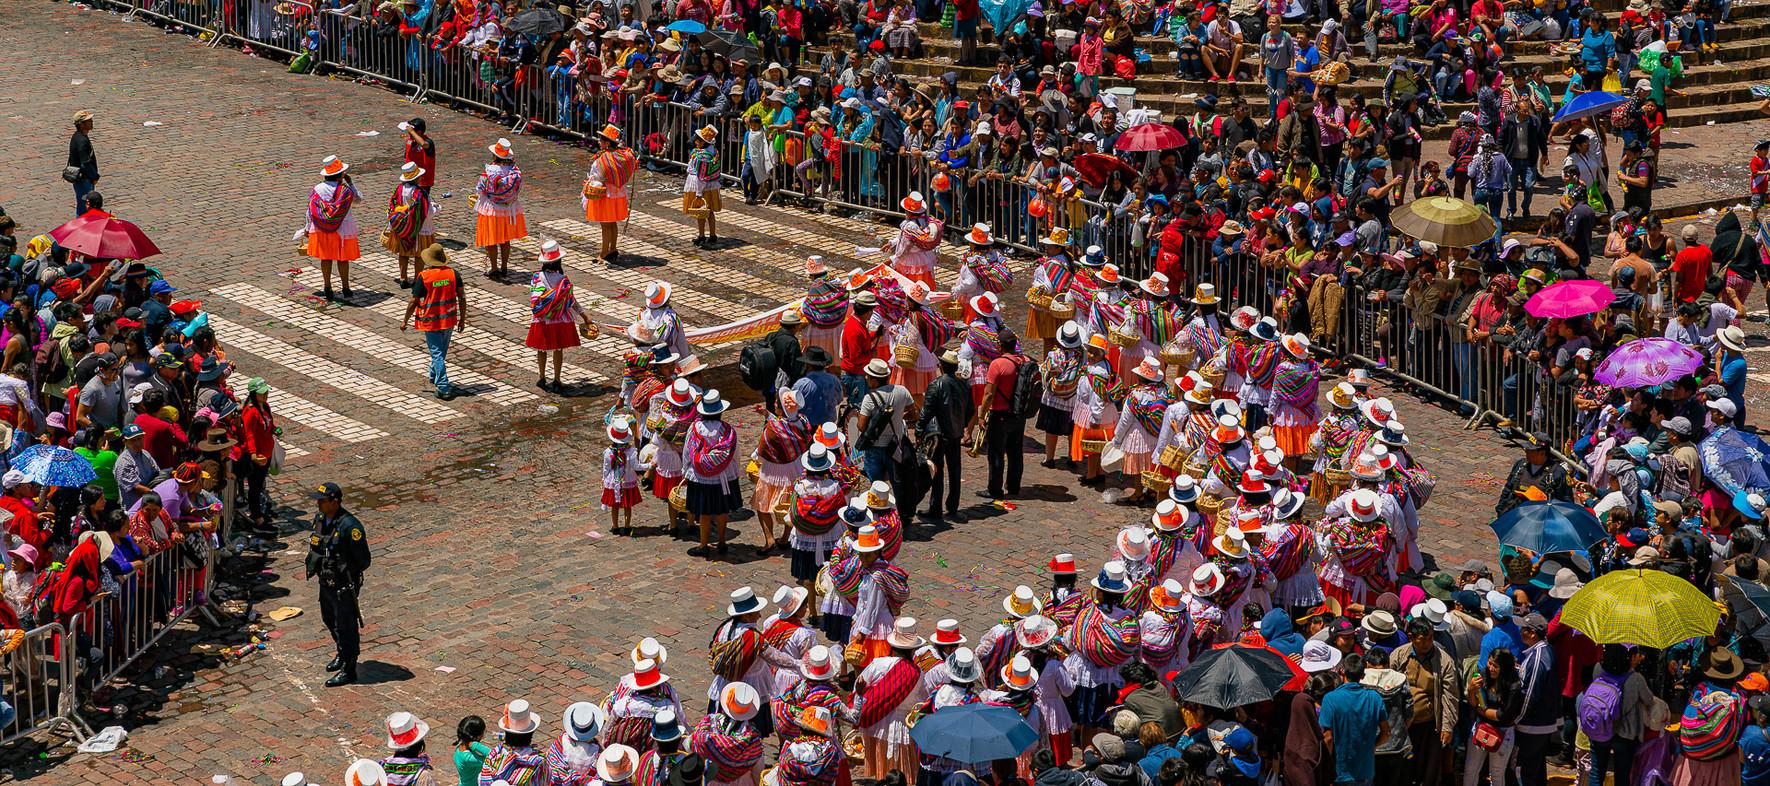 TKPA-Cusco201802-0035-HDWH.jpg